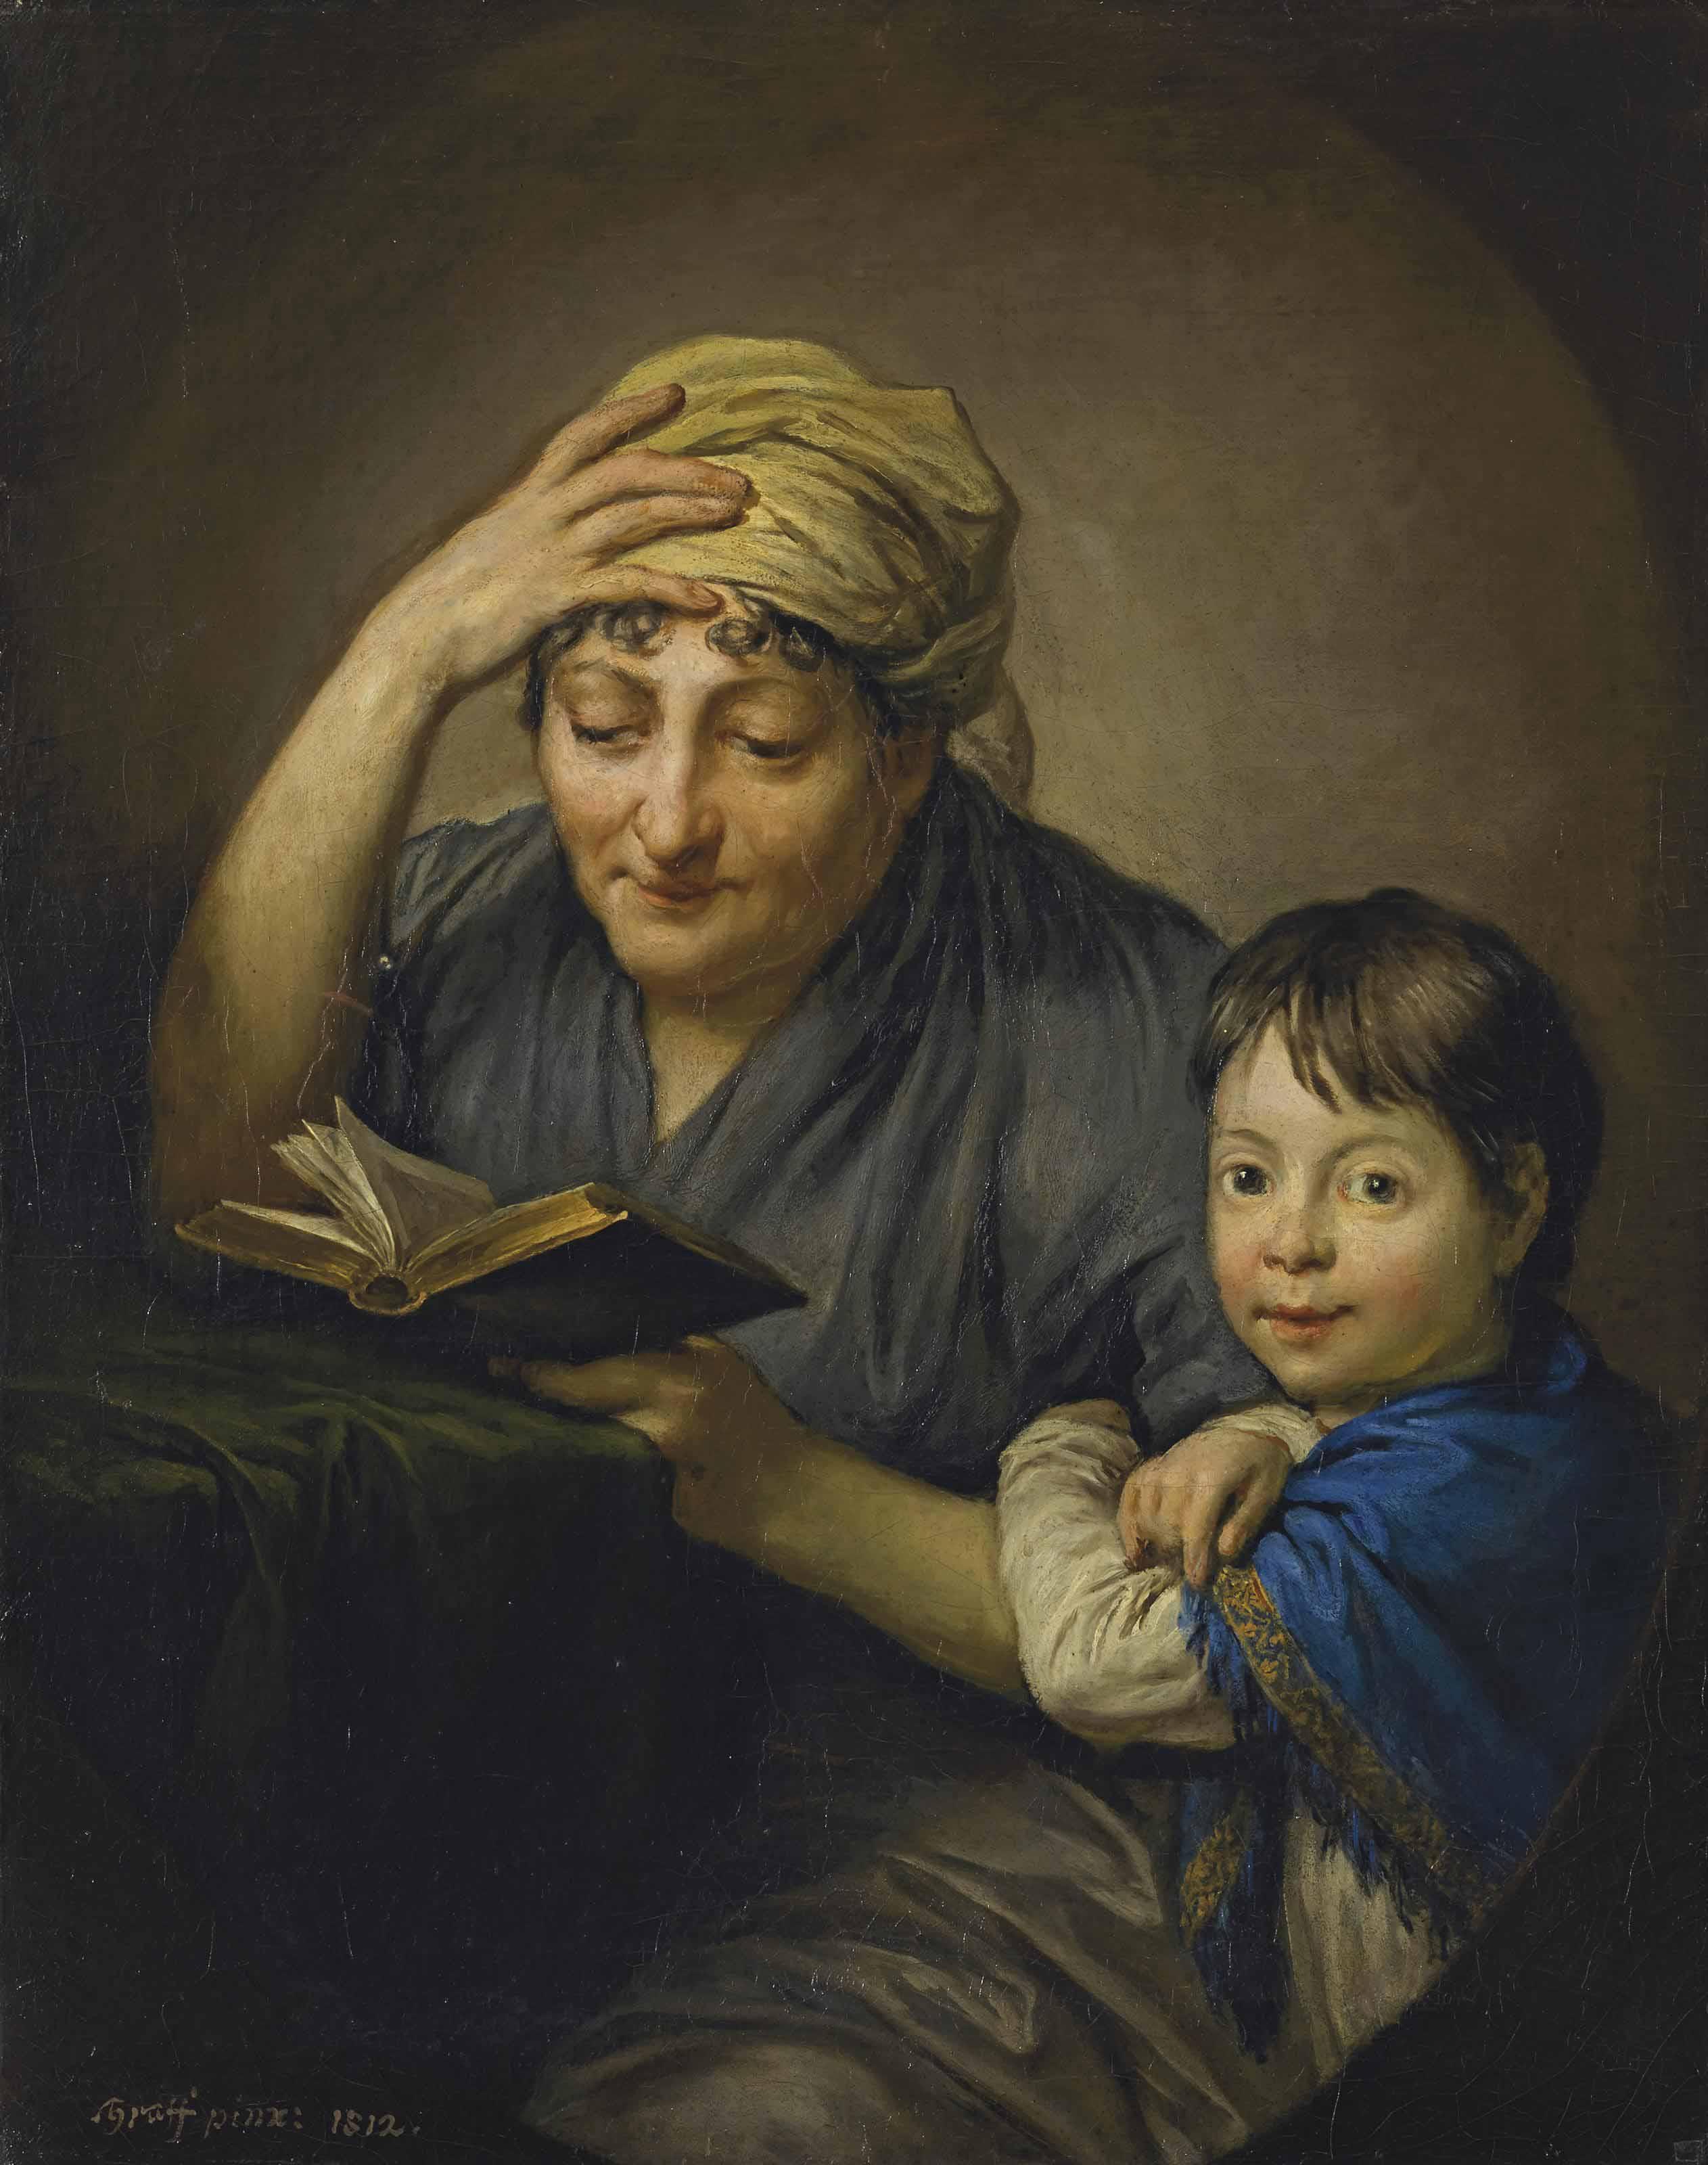 Frau Graff mit Enkelin, 1812